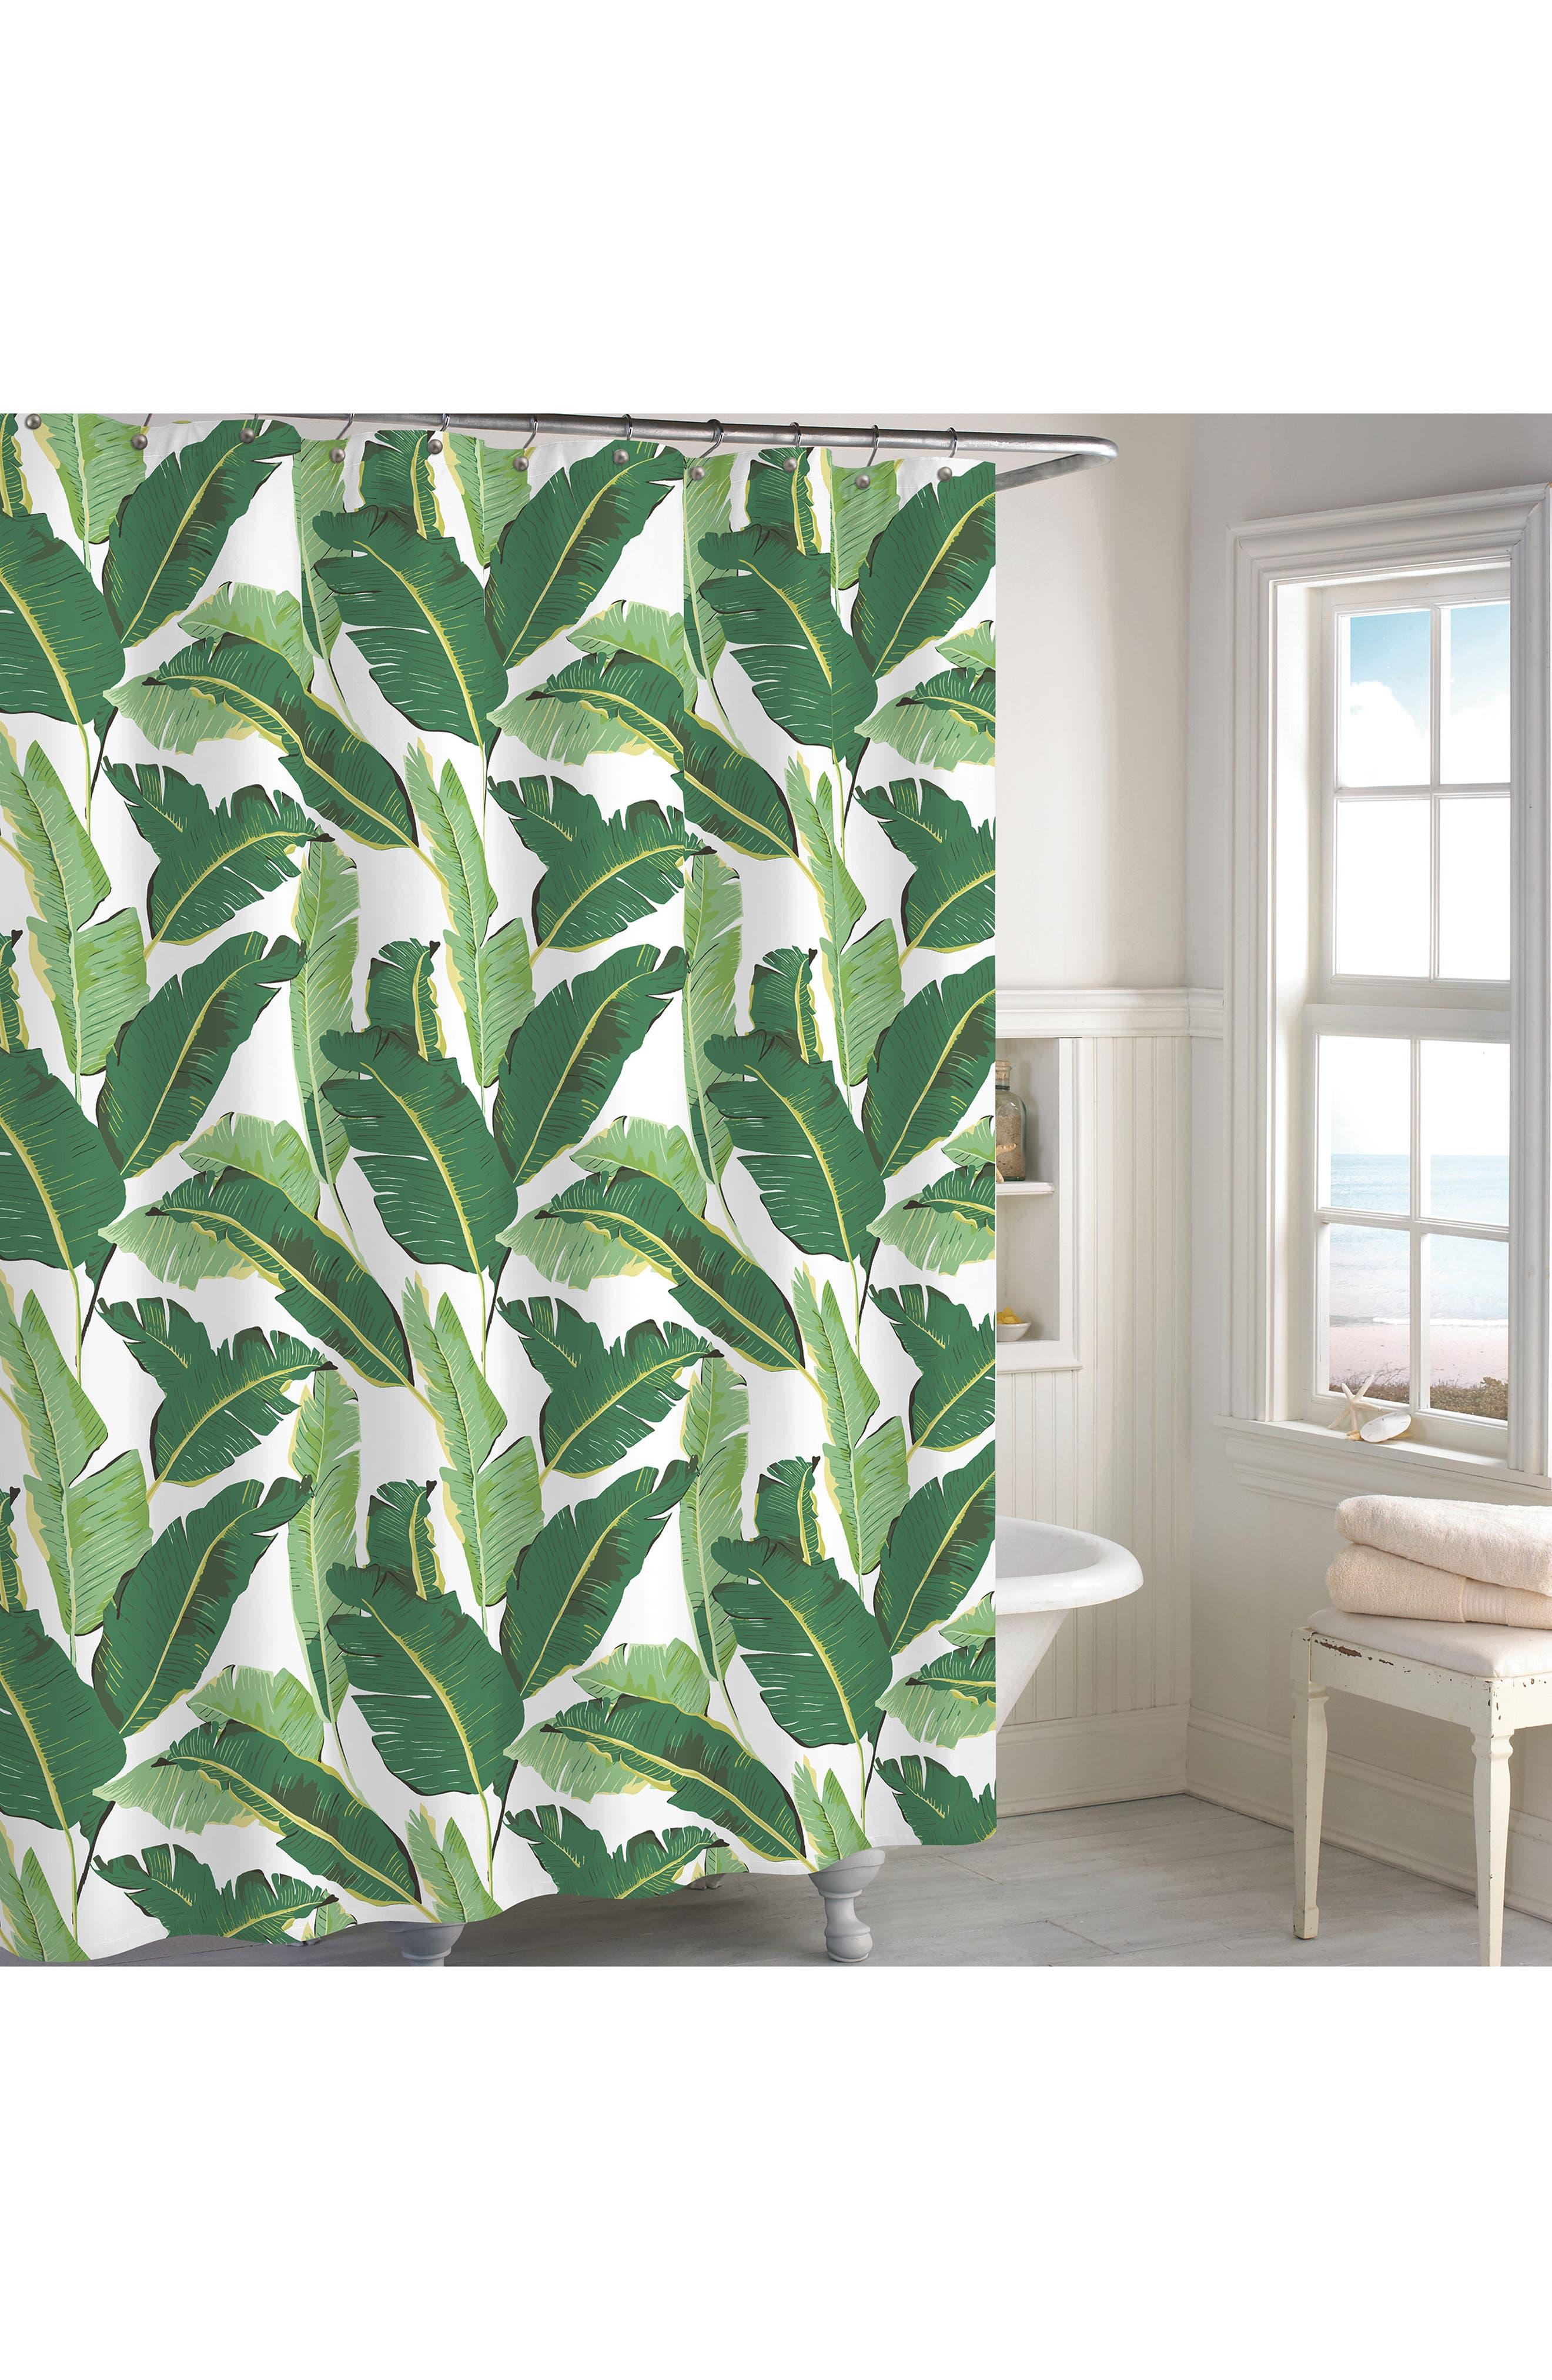 Miami Leaf Shower Curtain,                             Main thumbnail 1, color,                             300